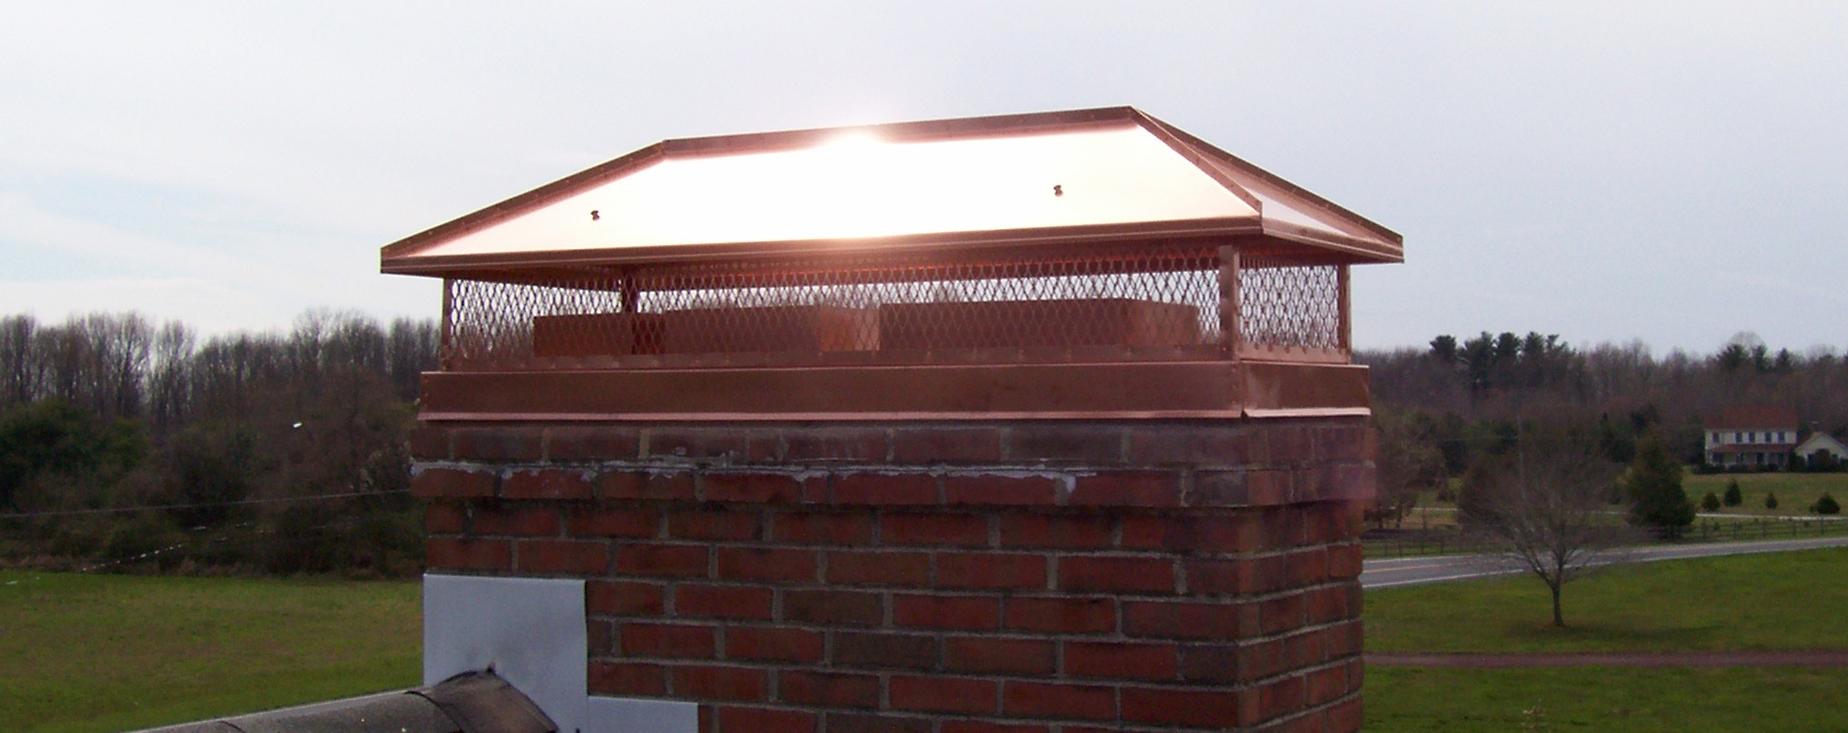 Custom Copper Chimney Caps Chimcare Metal Decorative